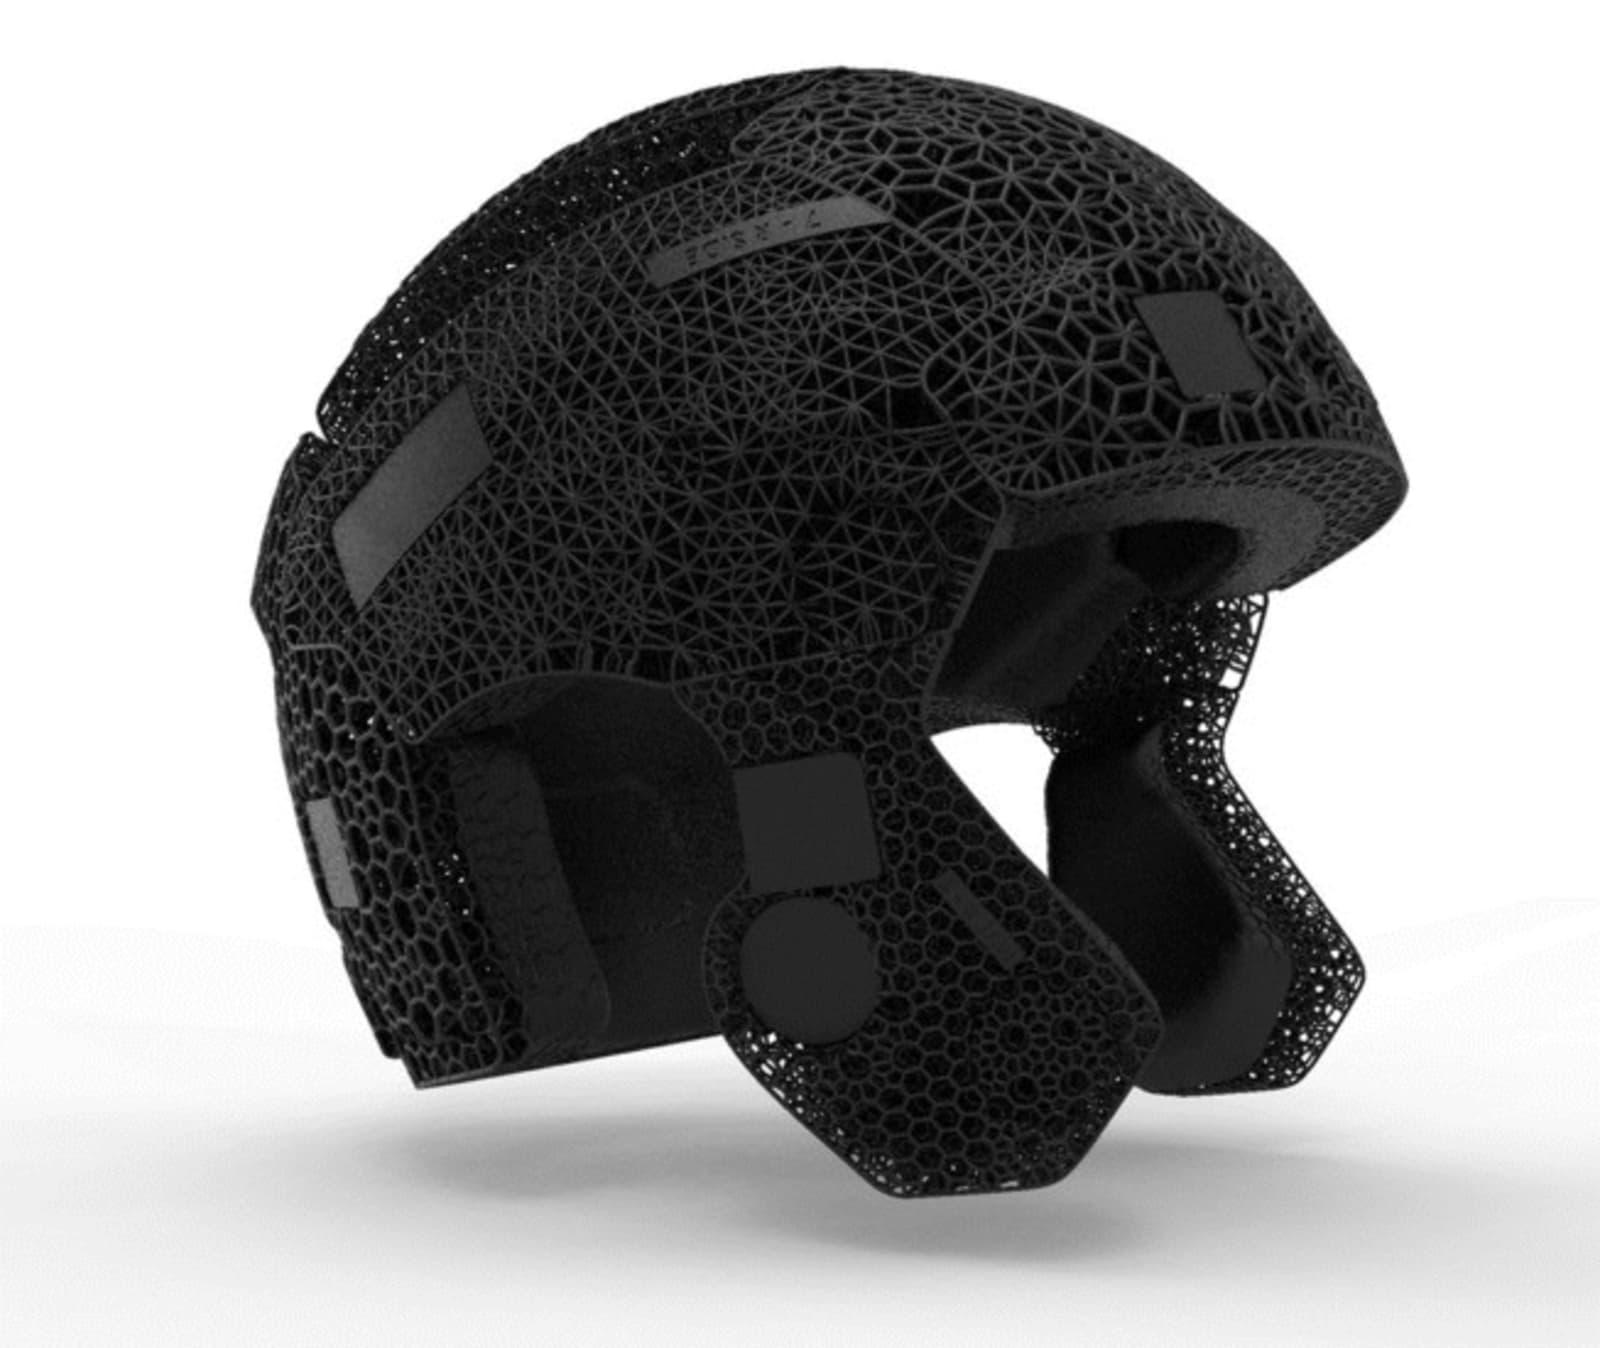 Riddell SpeedFlex Precision Diamond helmet